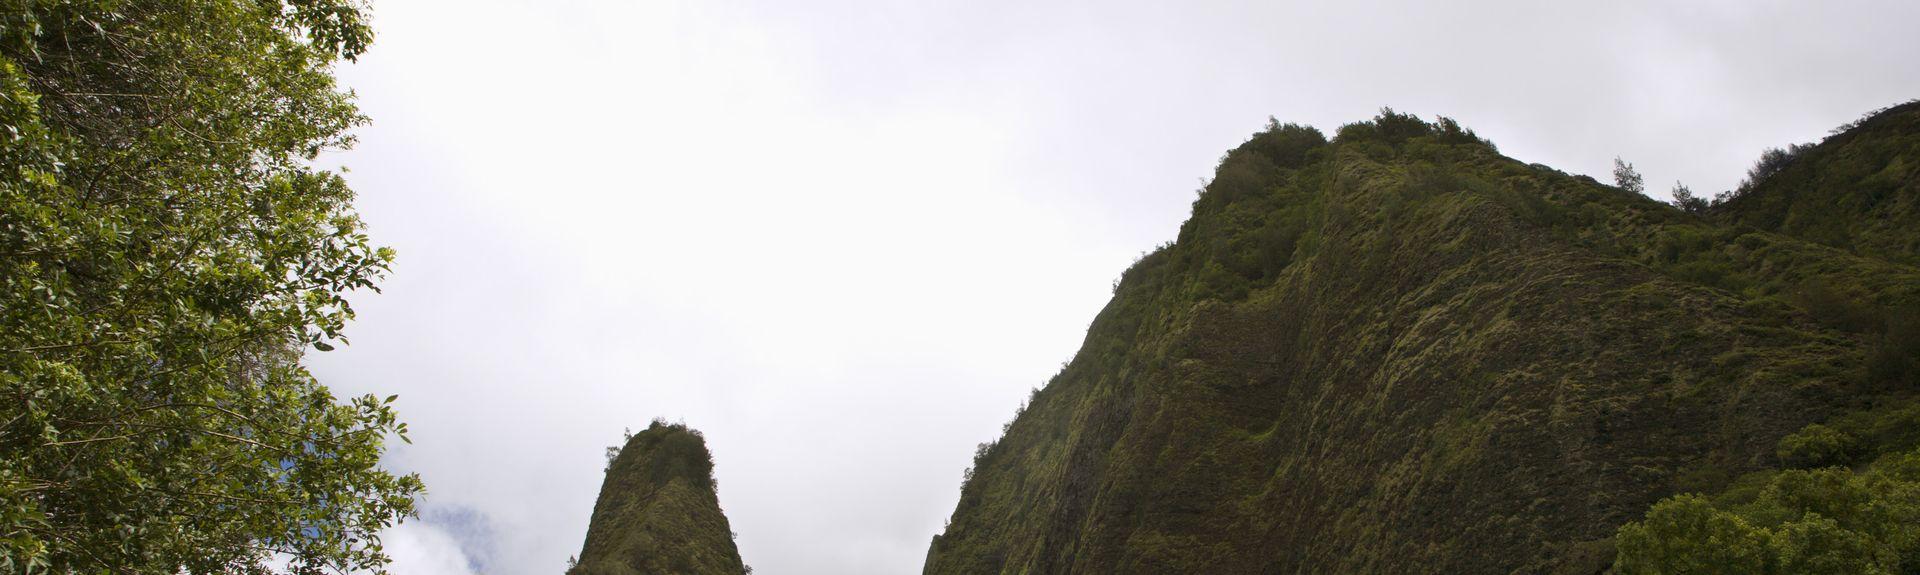 Waialua, Maui County, Hawaii, Vereinigte Staaten